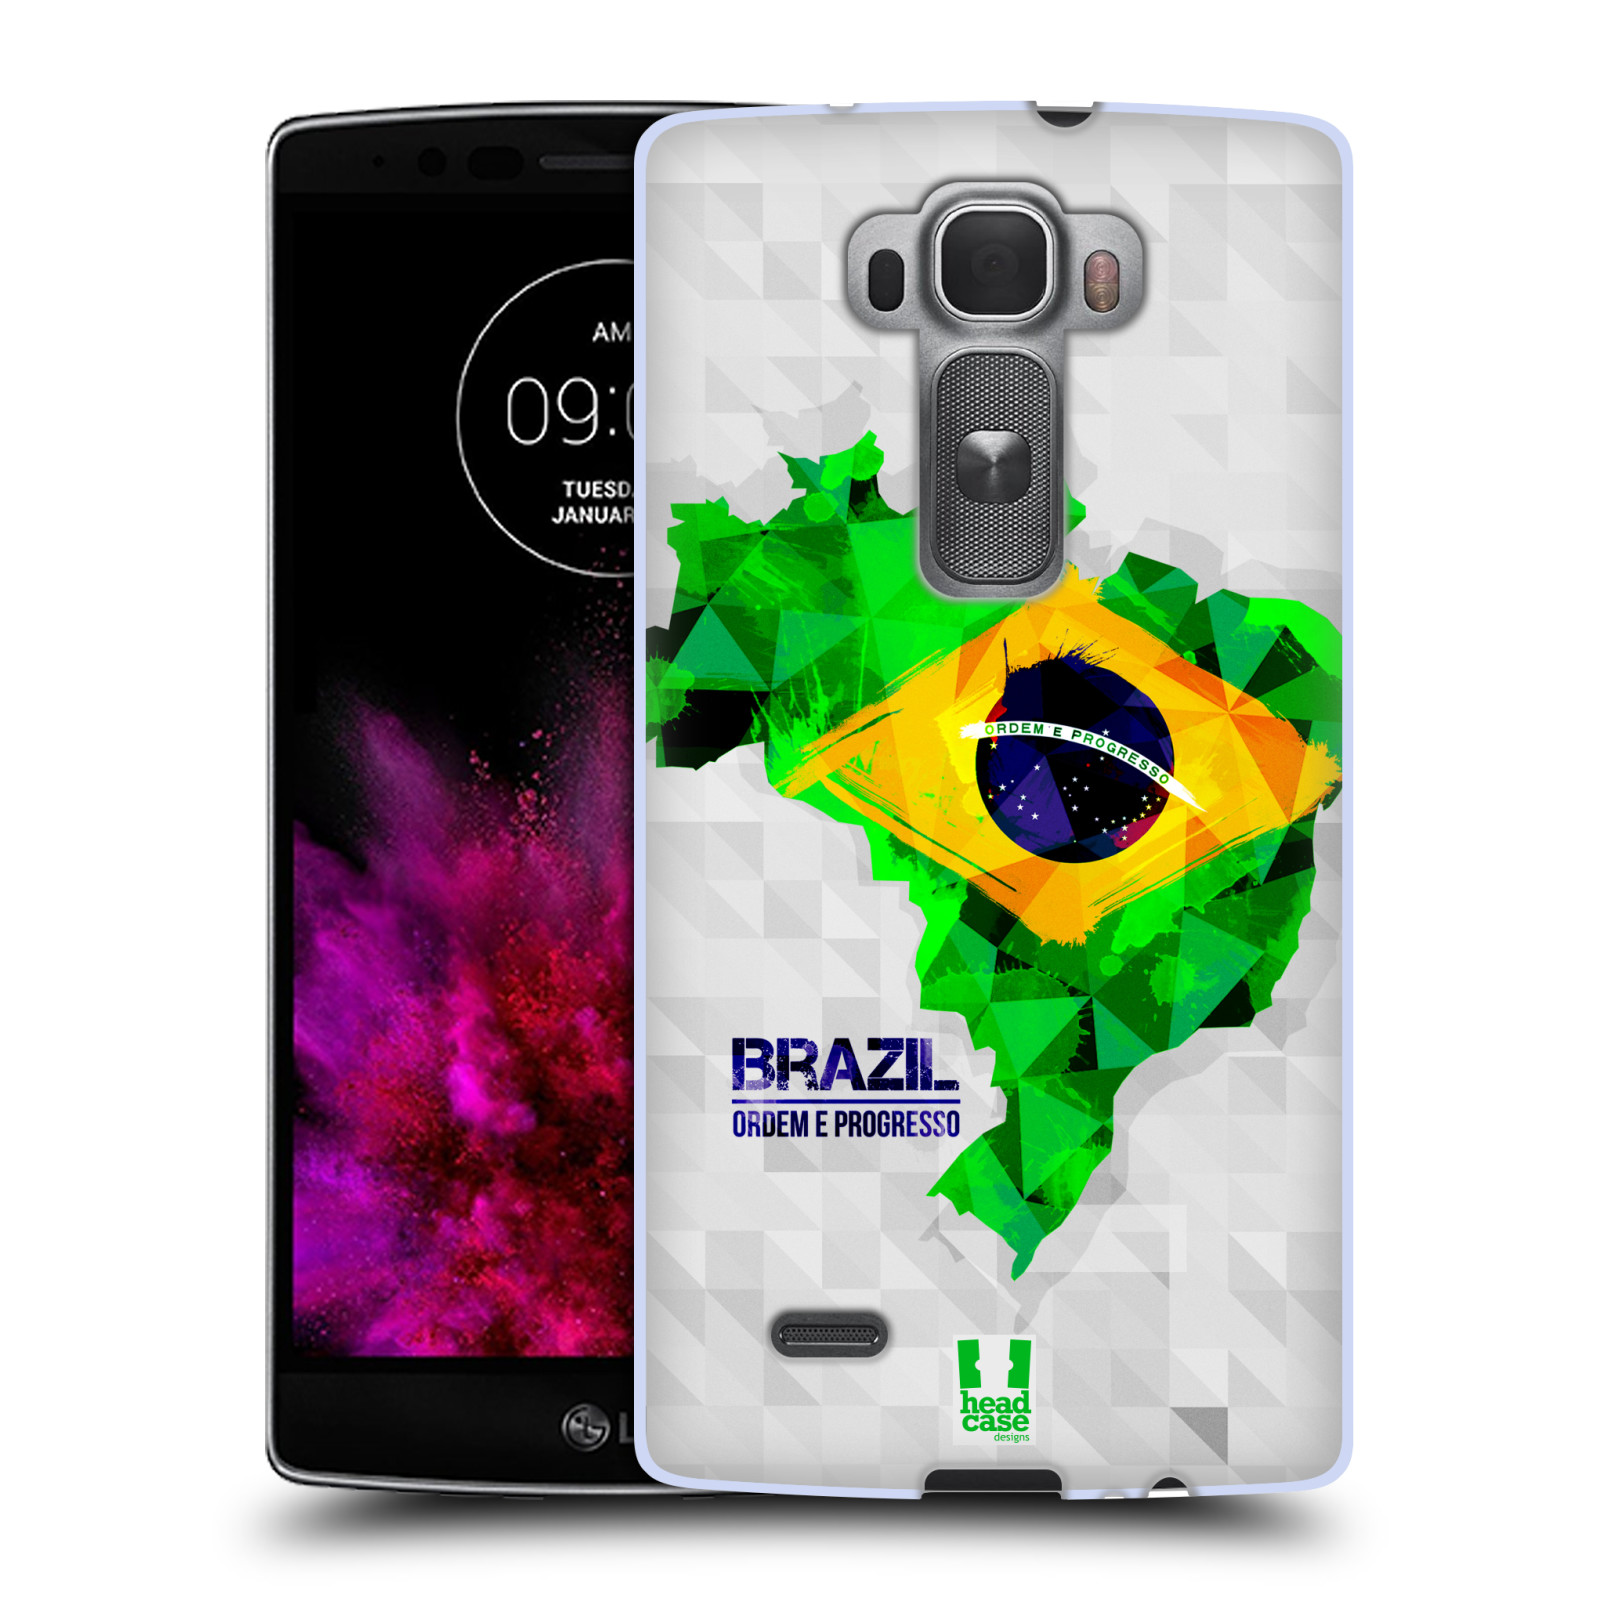 Silikonové pouzdro na mobil LG G Flex 2 HEAD CASE GEOMAPA BRAZÍLIE (Silikonový kryt či obal na mobilní telefon LG G Flex 2 H955)